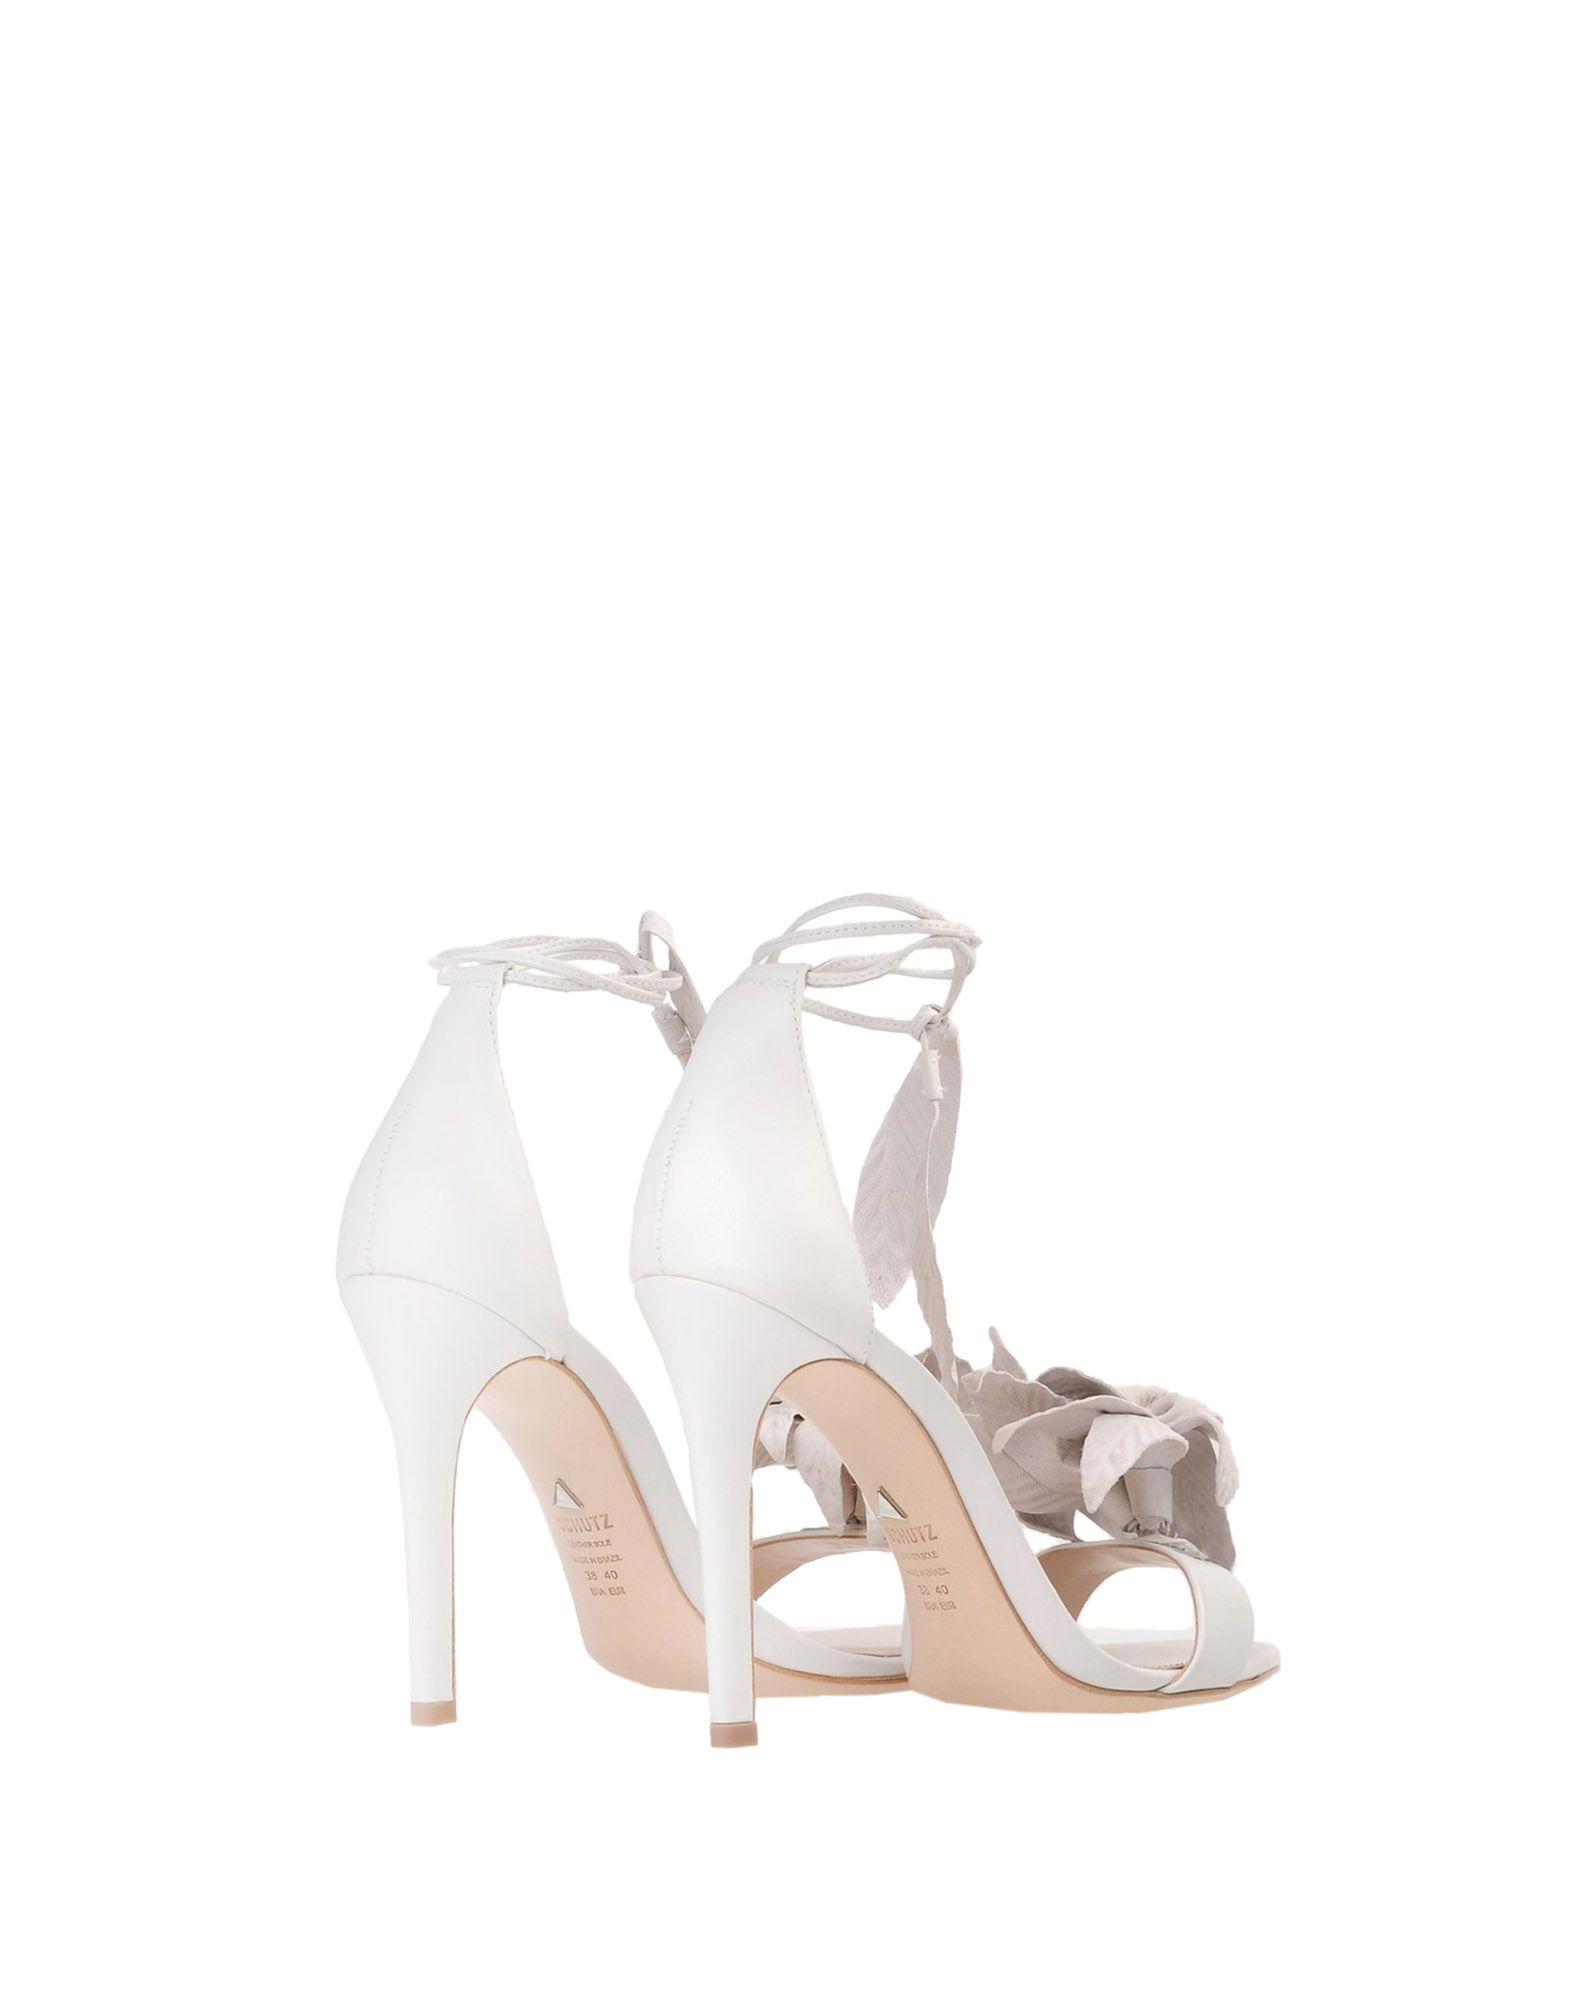 Stilvolle billige Schuhe Damen Schutz Sandalen Damen Schuhe  11458127DX dcb110